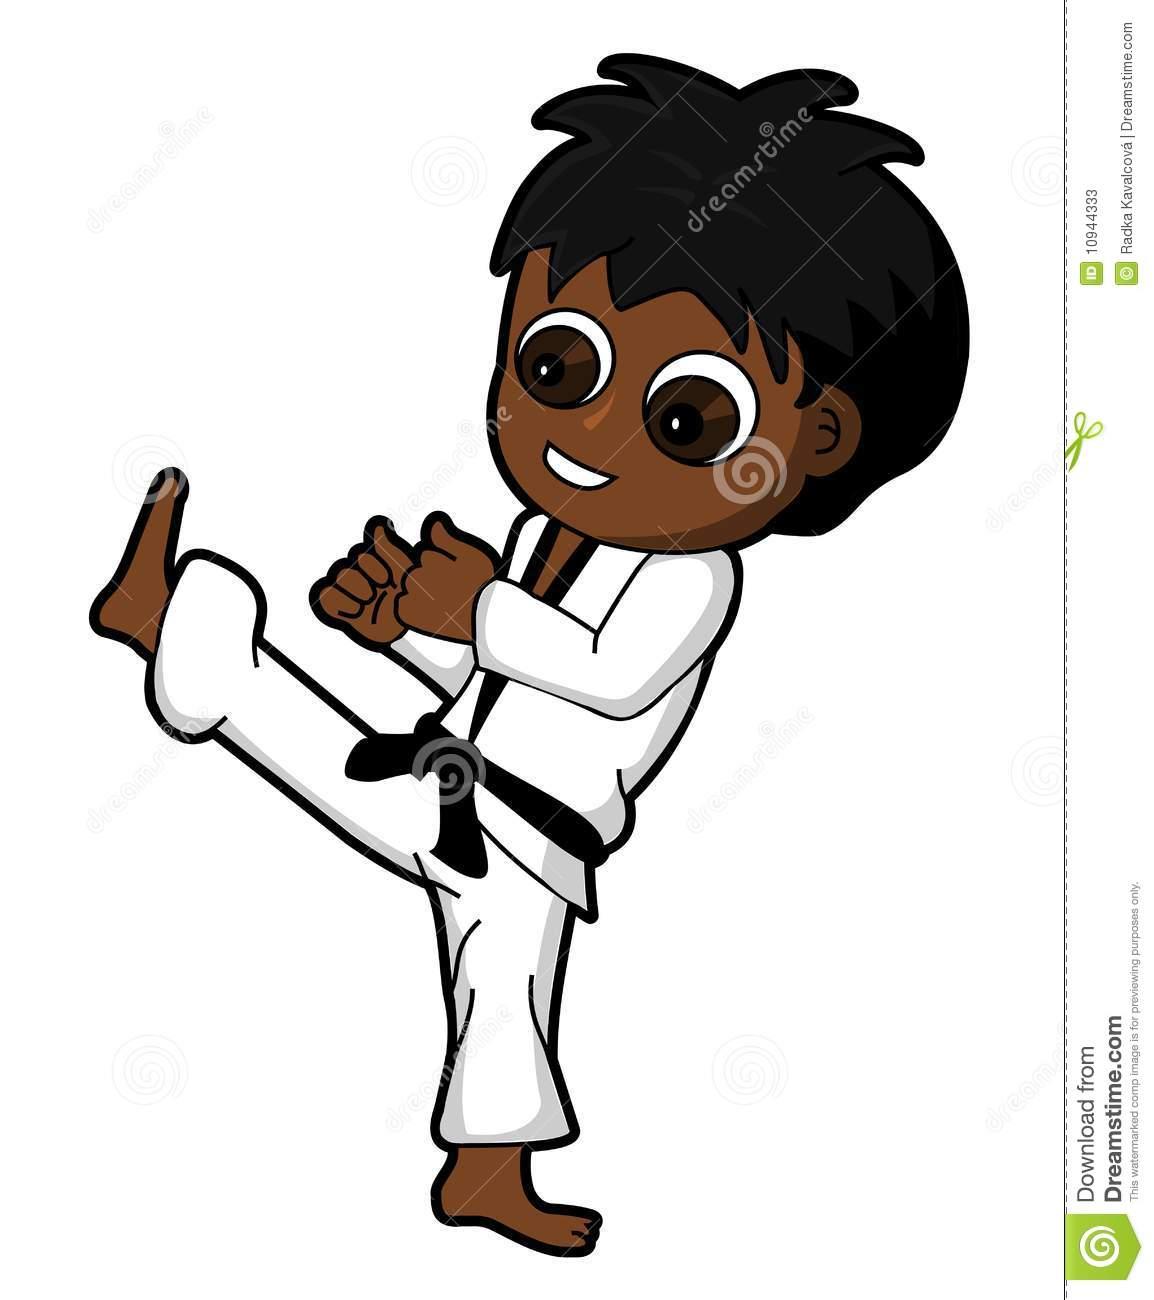 1154x1300 Karate Clipart Karate Punch